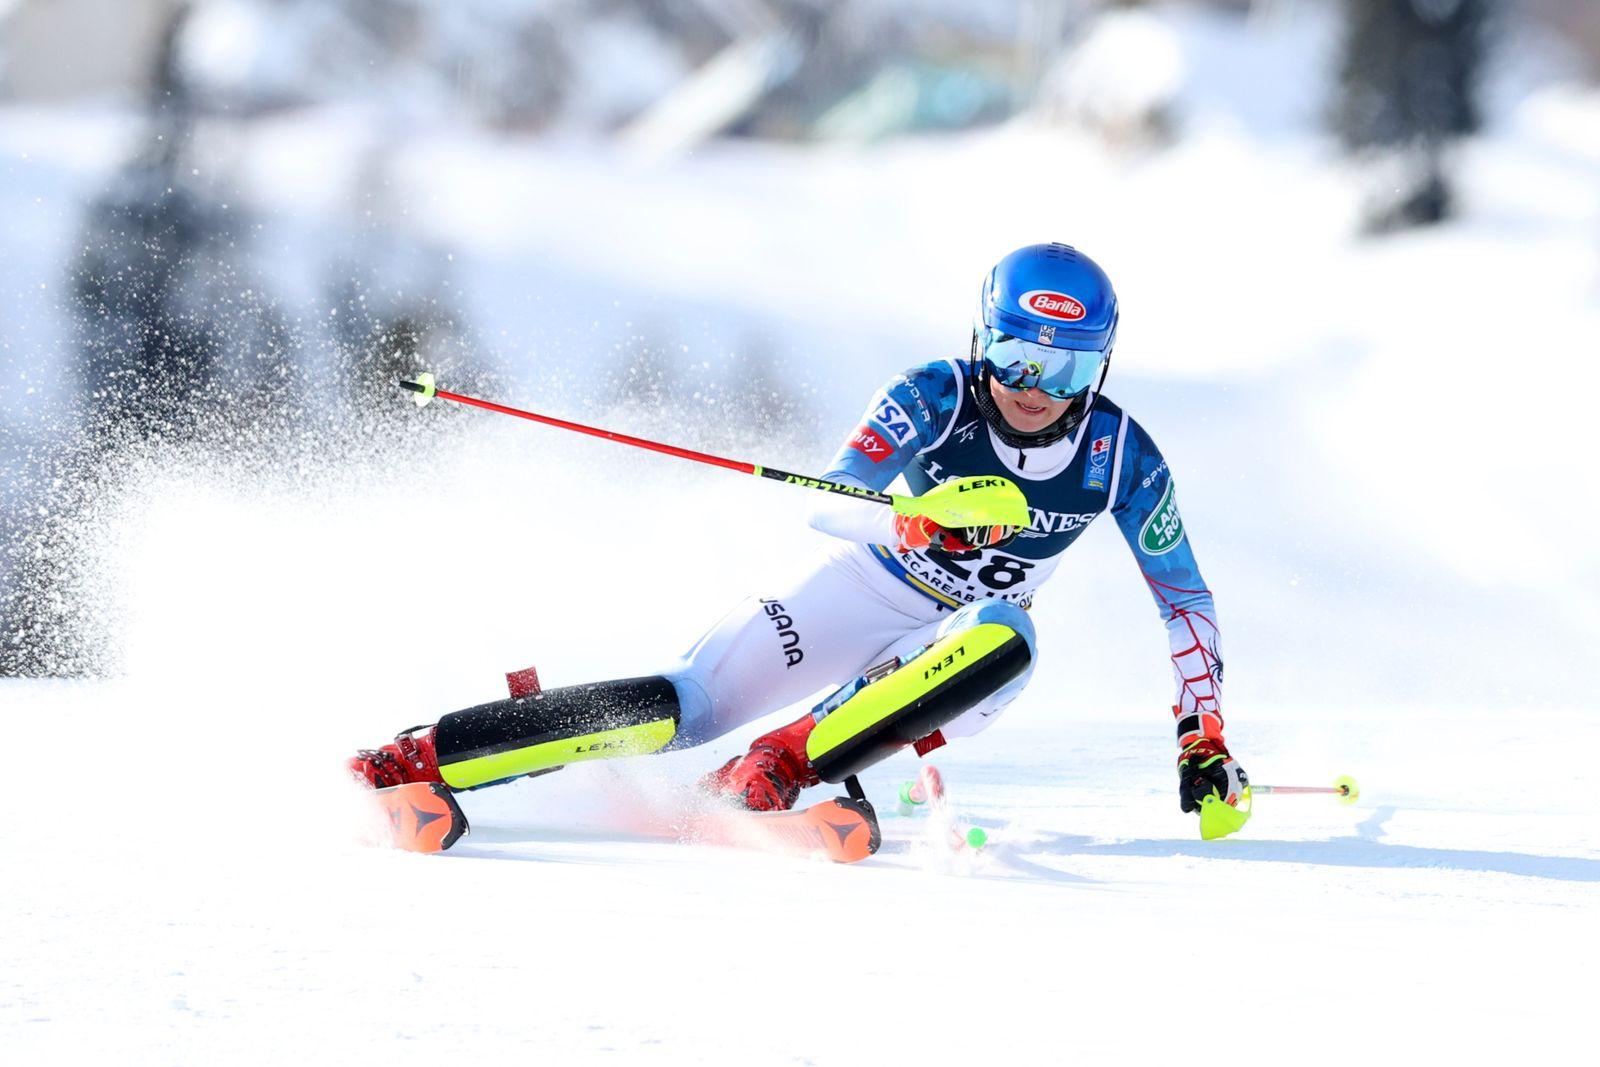 FIS World Ski Championships - Women's Alpine Combined